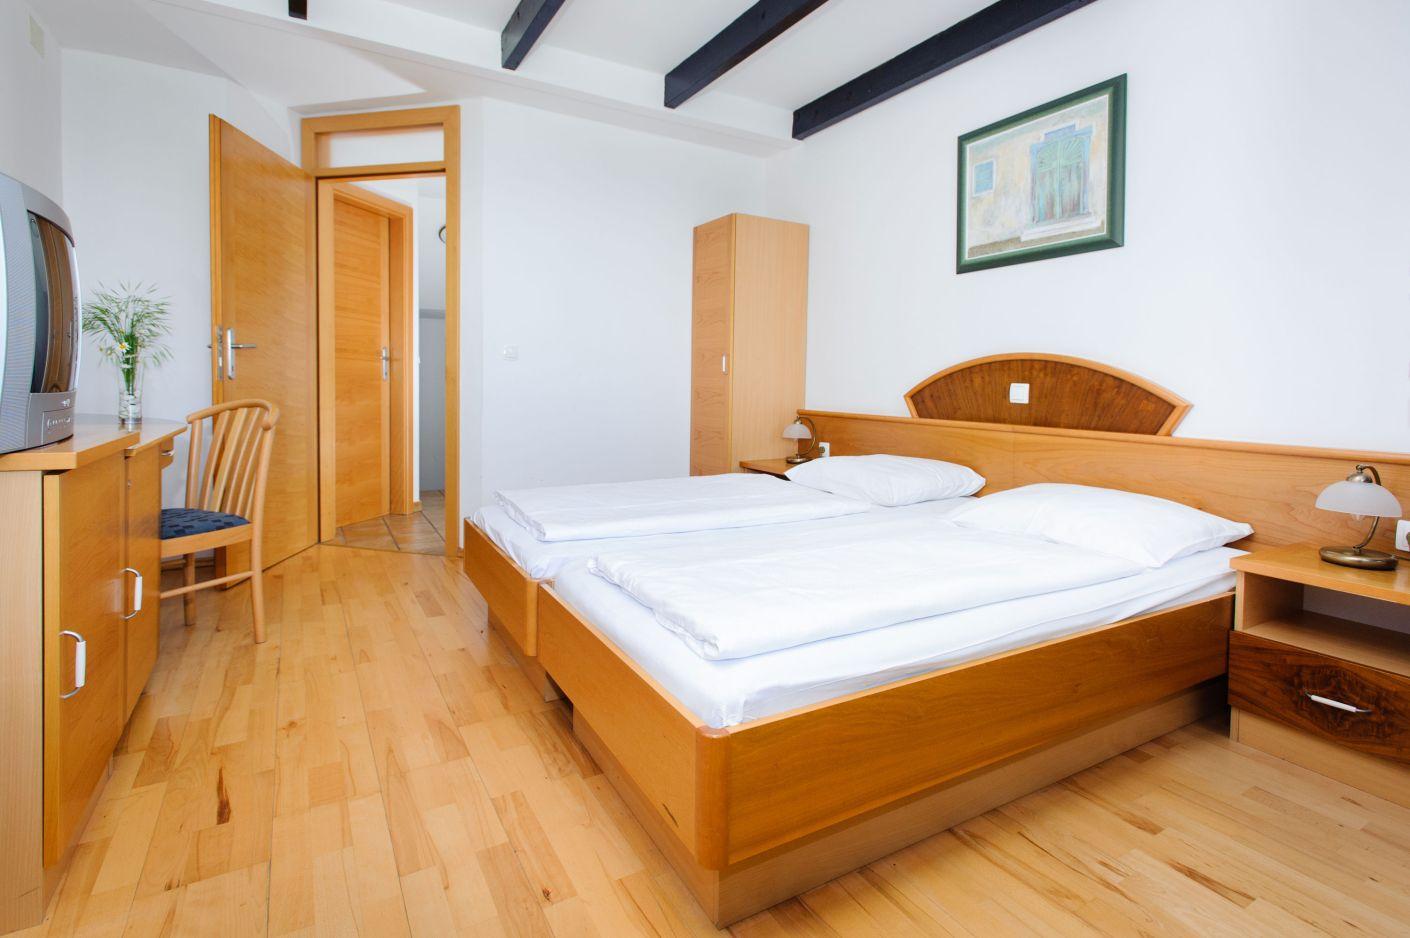 Hotel-Brinje-2-3-double-roo